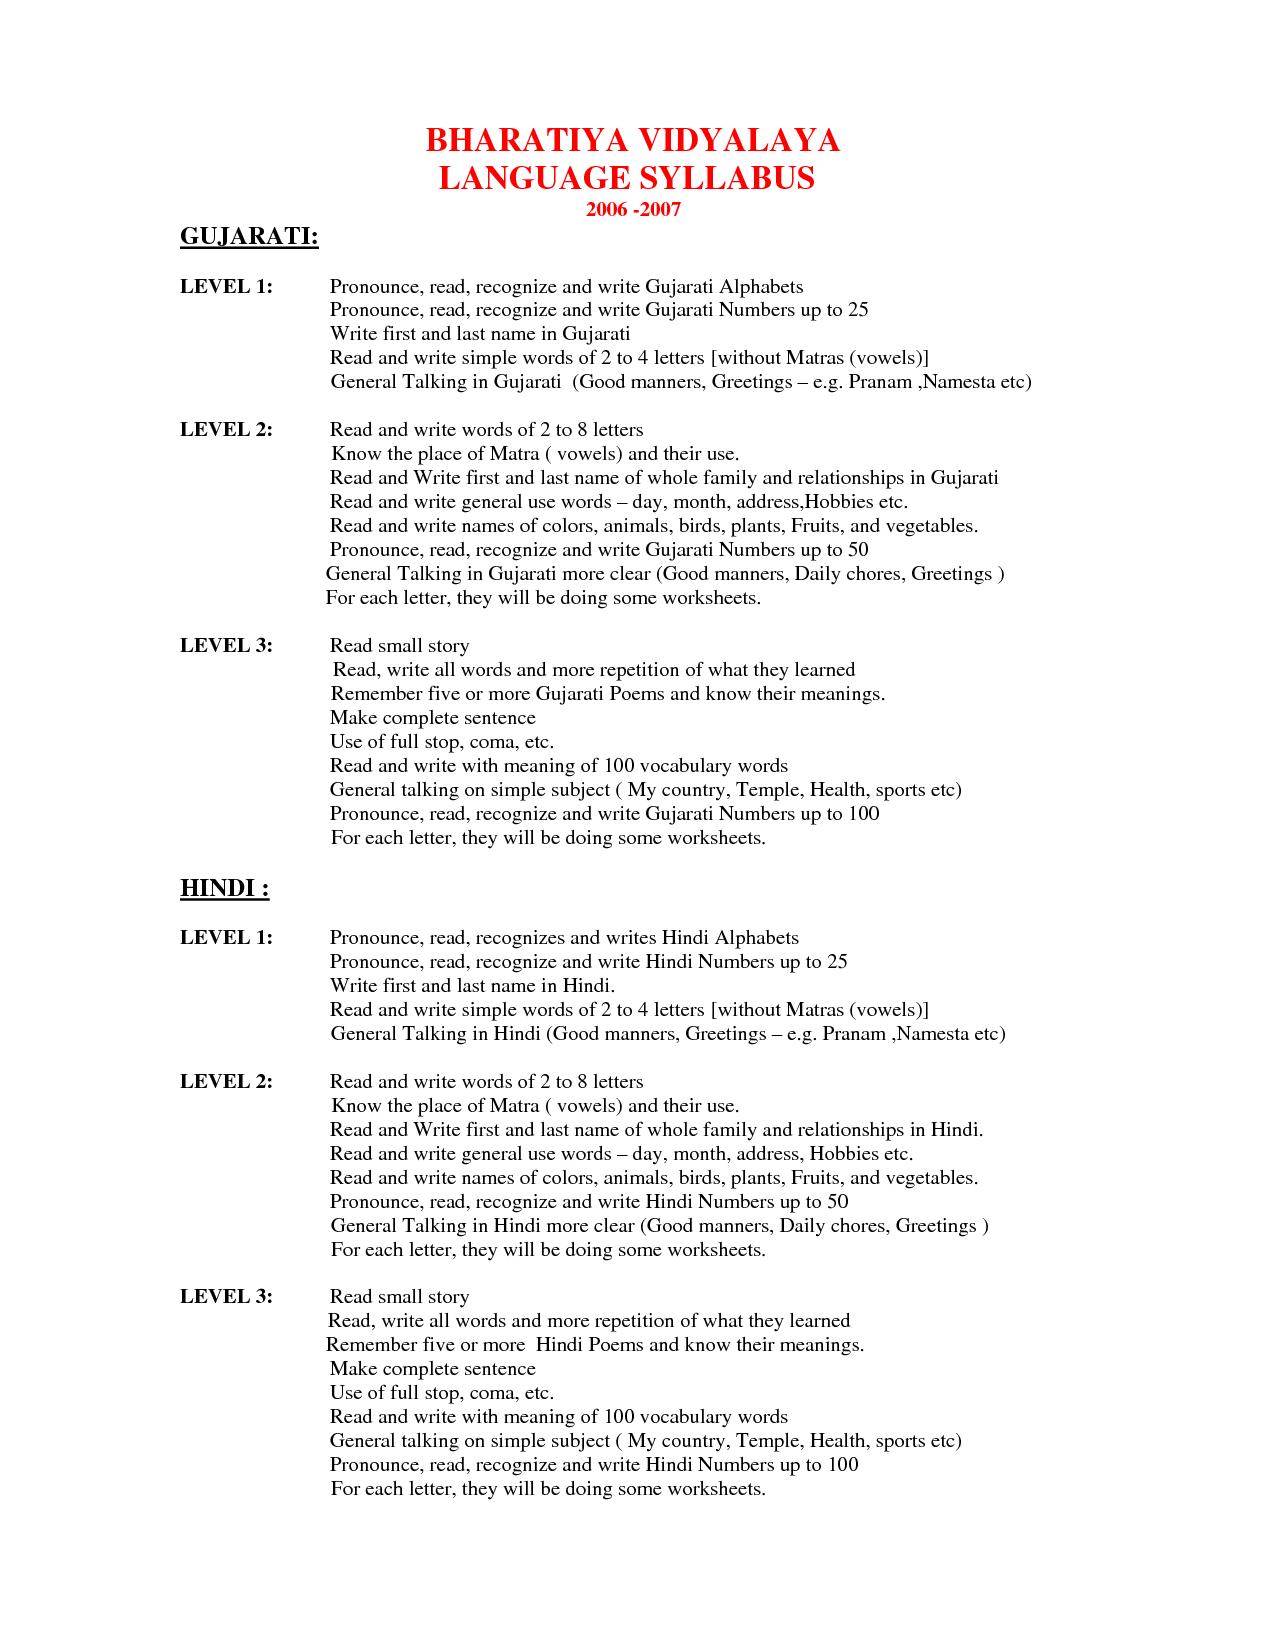 Hindi Worksheets [ 1650 x 1275 Pixel ]